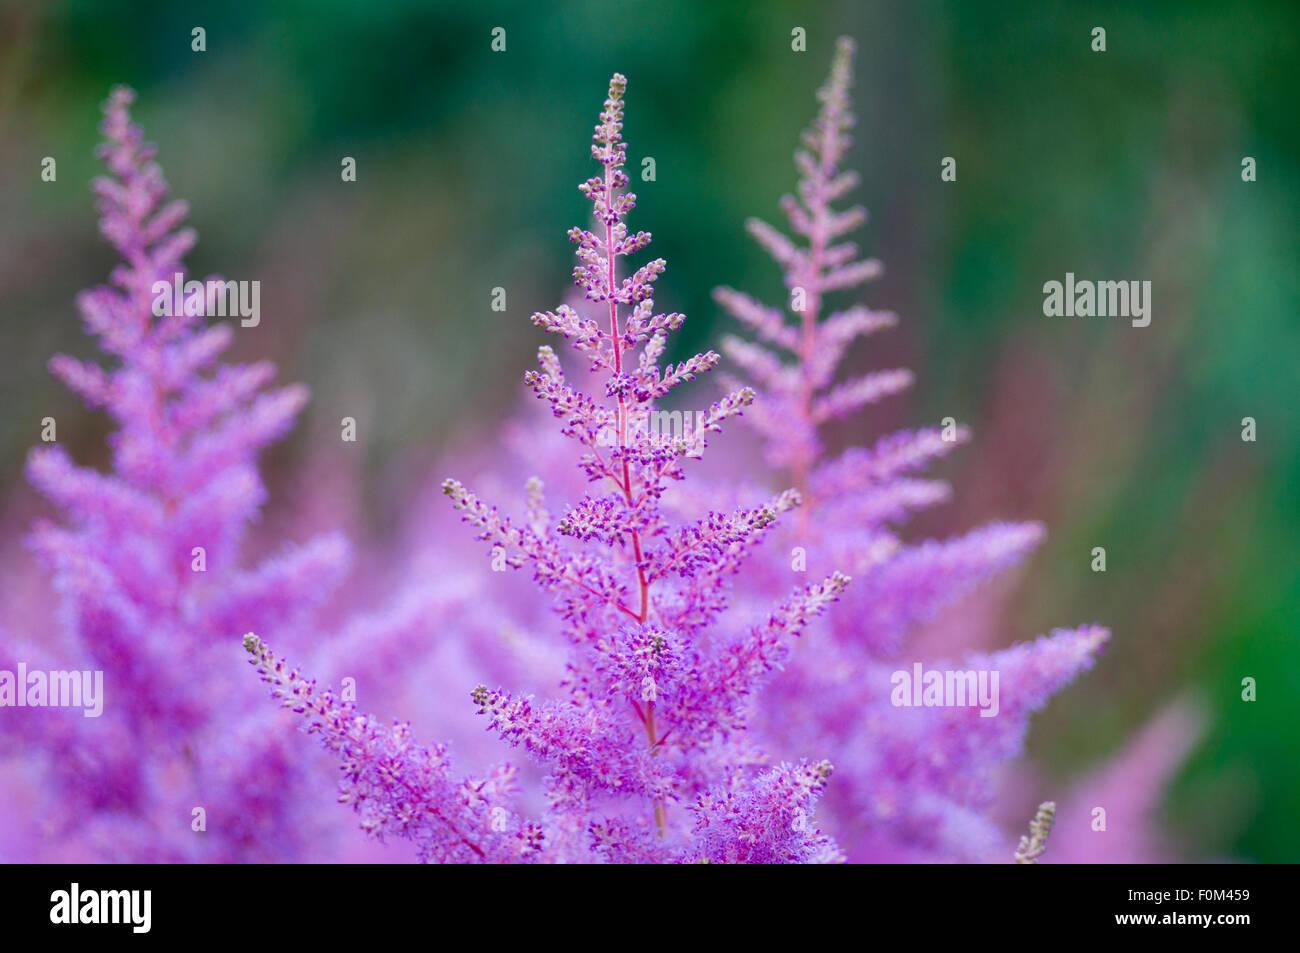 gros plan fleurs astilbe rose banque d'images, photo stock: 86494165